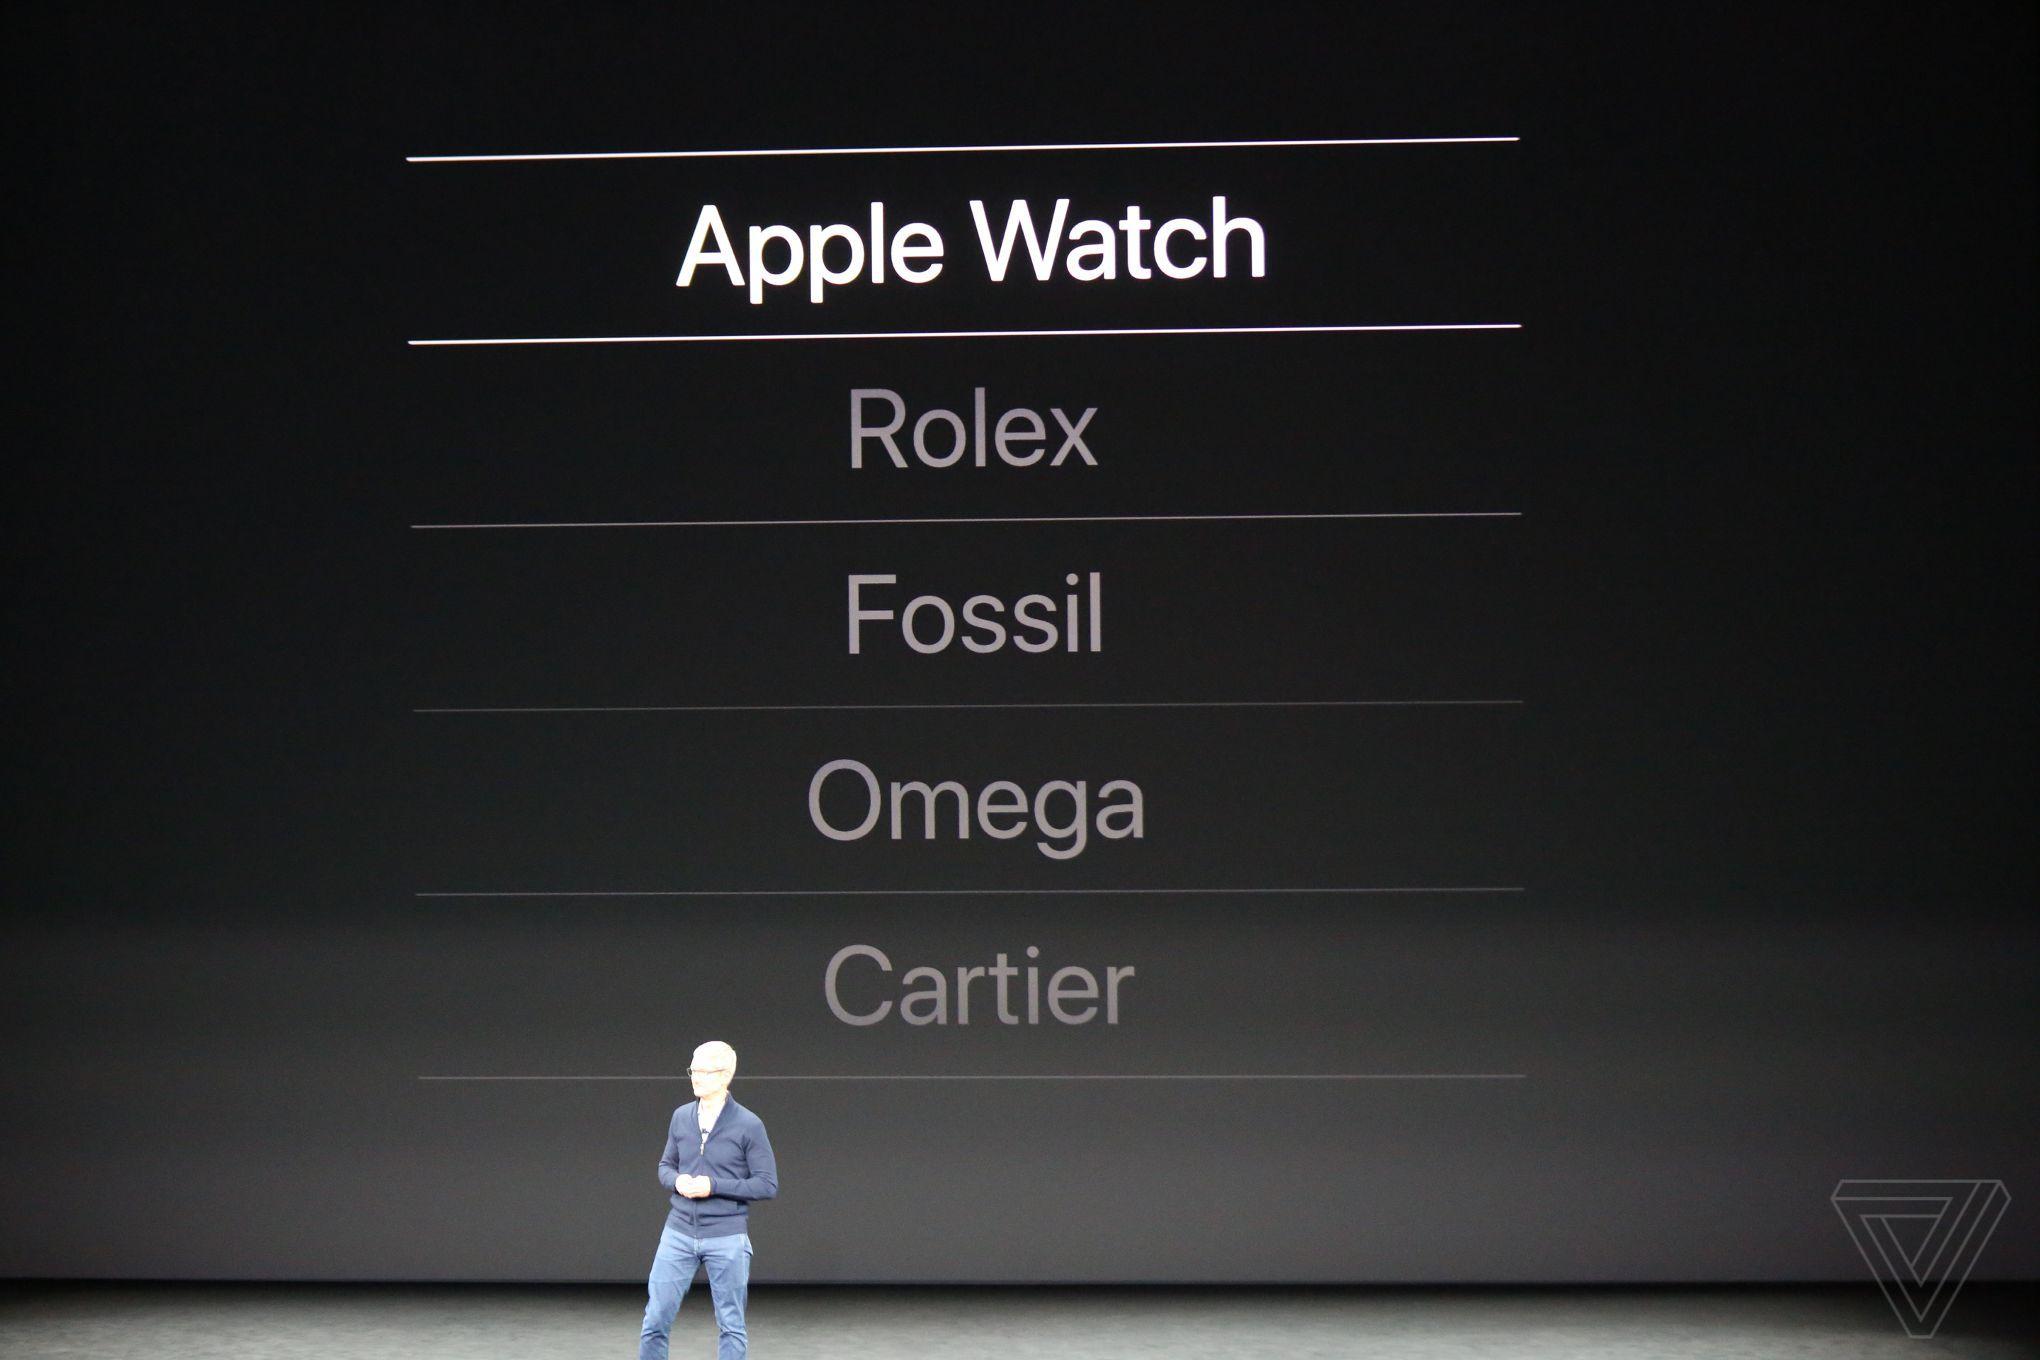 Apple Watch 9 New Apple Watch 3 Series